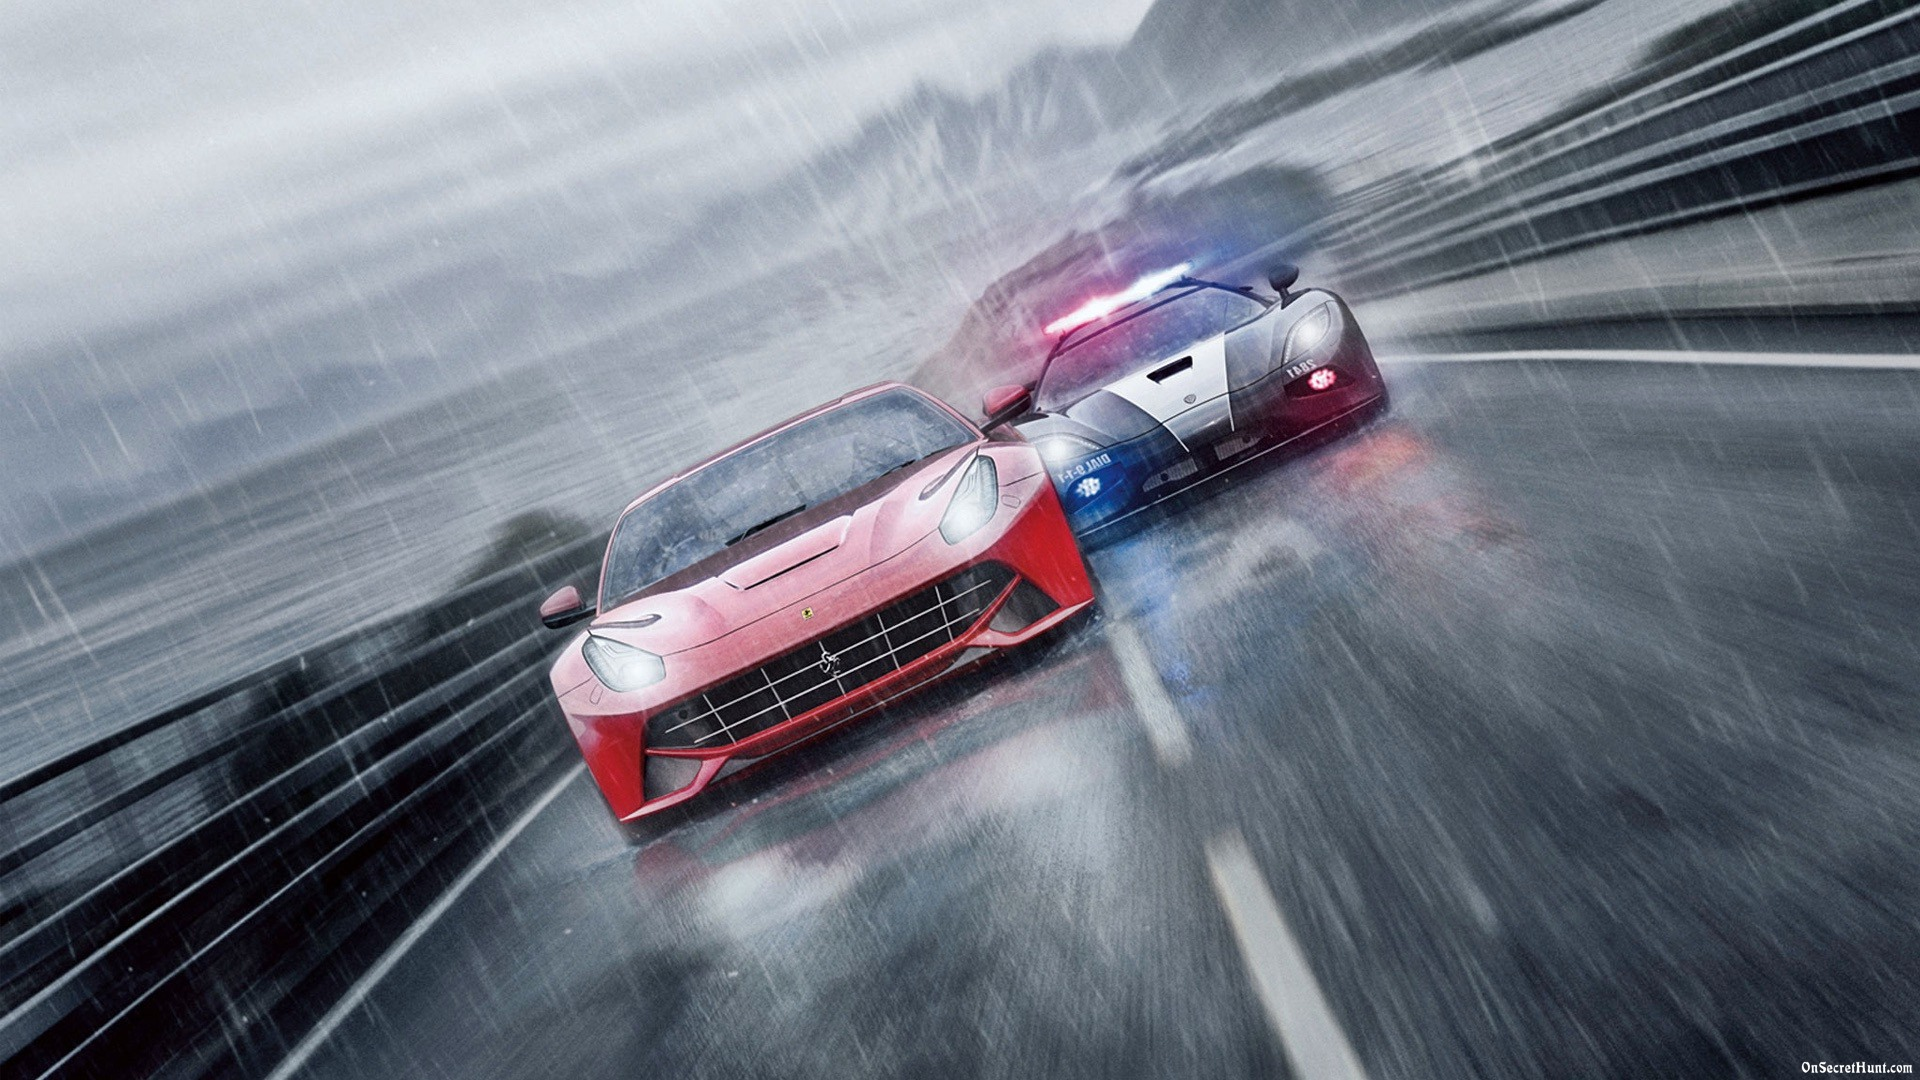 Обои Porsche 911, bmw m3 gts, mclaren p1, corvette c7. Игры foto 11